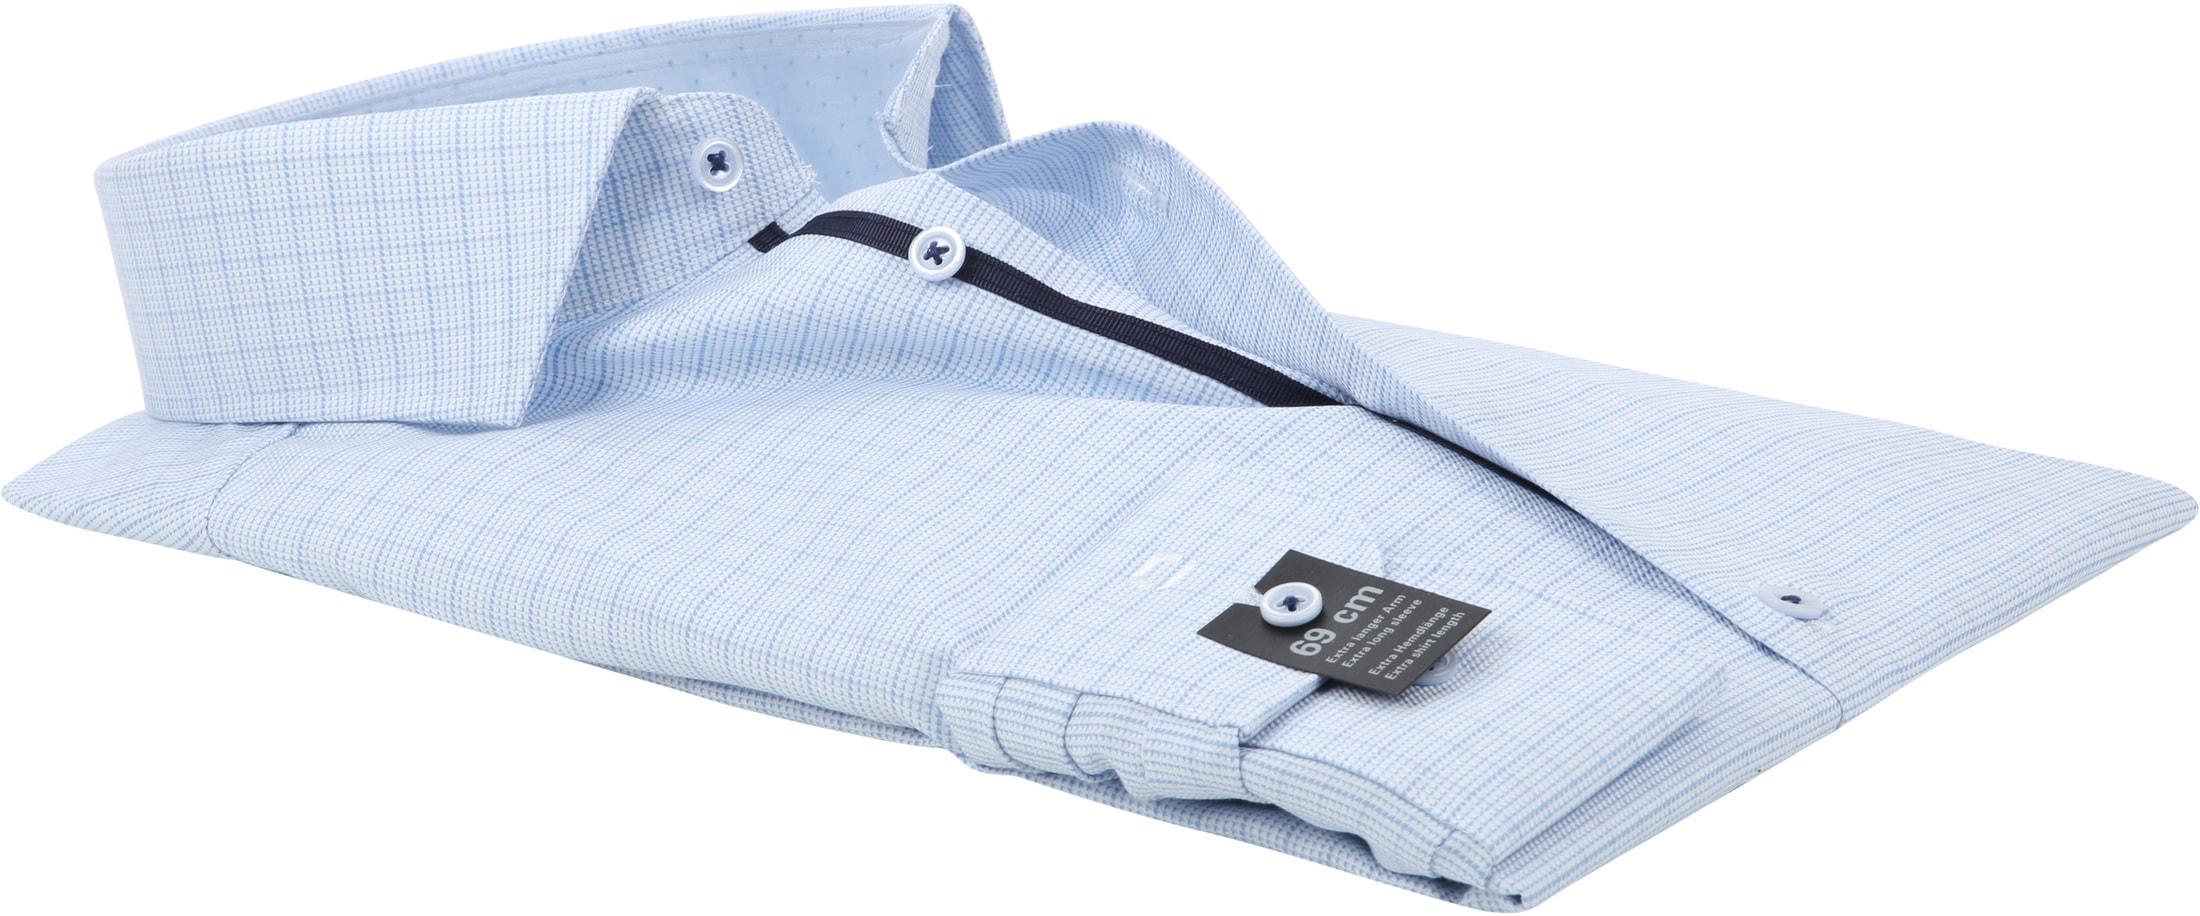 OLYMP Level 5 Blue Shirt BF SL7 Checks foto 3